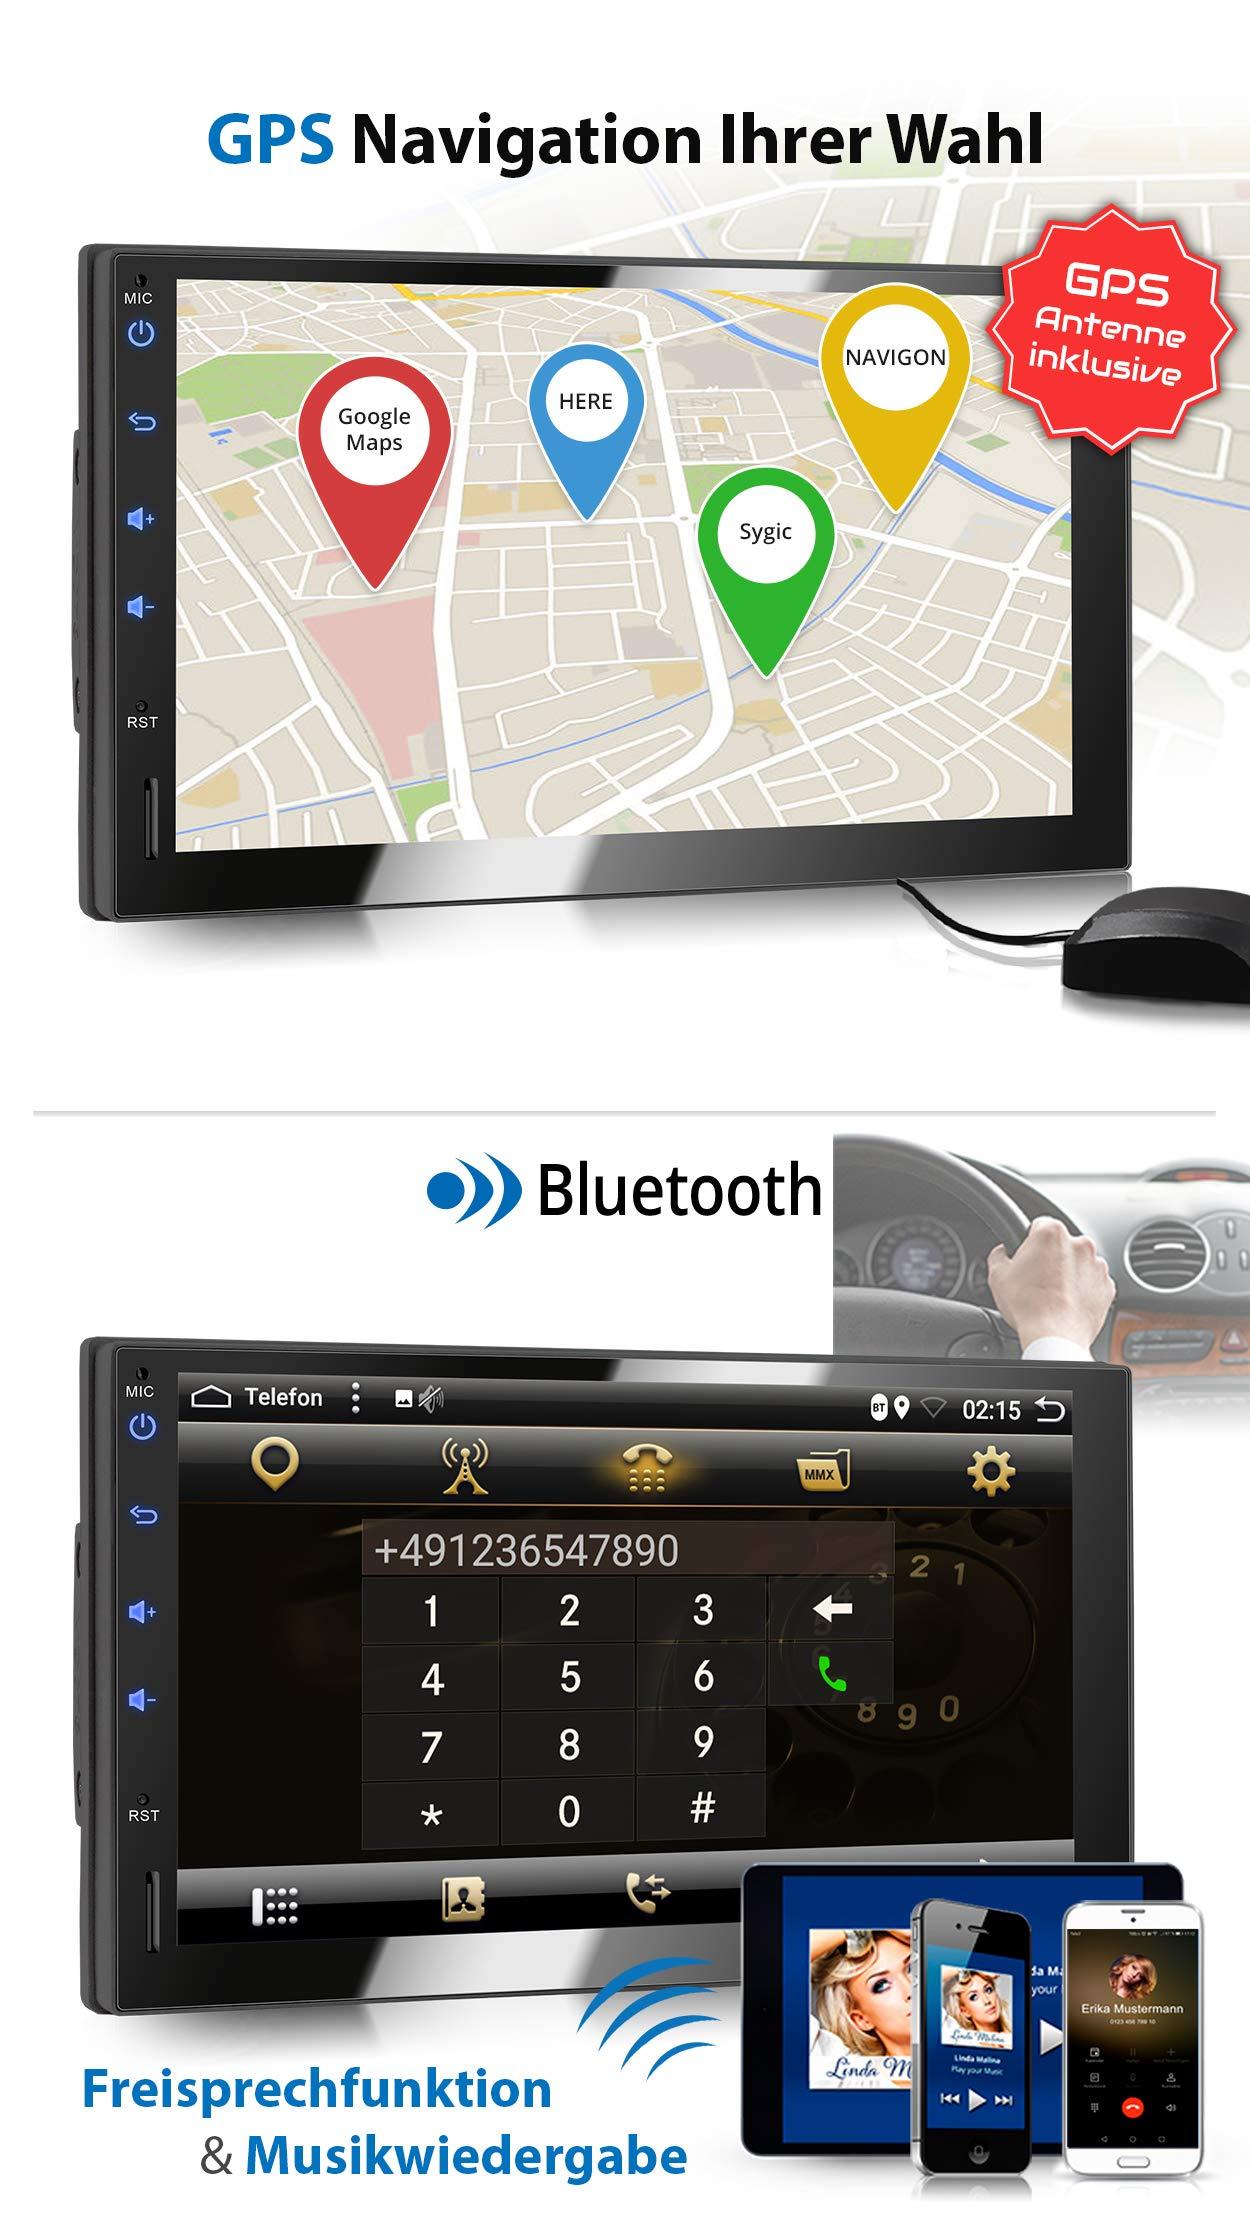 XOMAX-XM-2VA754-Autoradio-mit-Android-81-OctaCore-2GB-RAM-32GB-ROM-GPS-Navigation-I-Support-WiFi-WLAN-3G-4G-DAB-OBD2-I-Bluetooth-7-Zoll-18-cm-Touchscreen-USB-SD-2-DIN